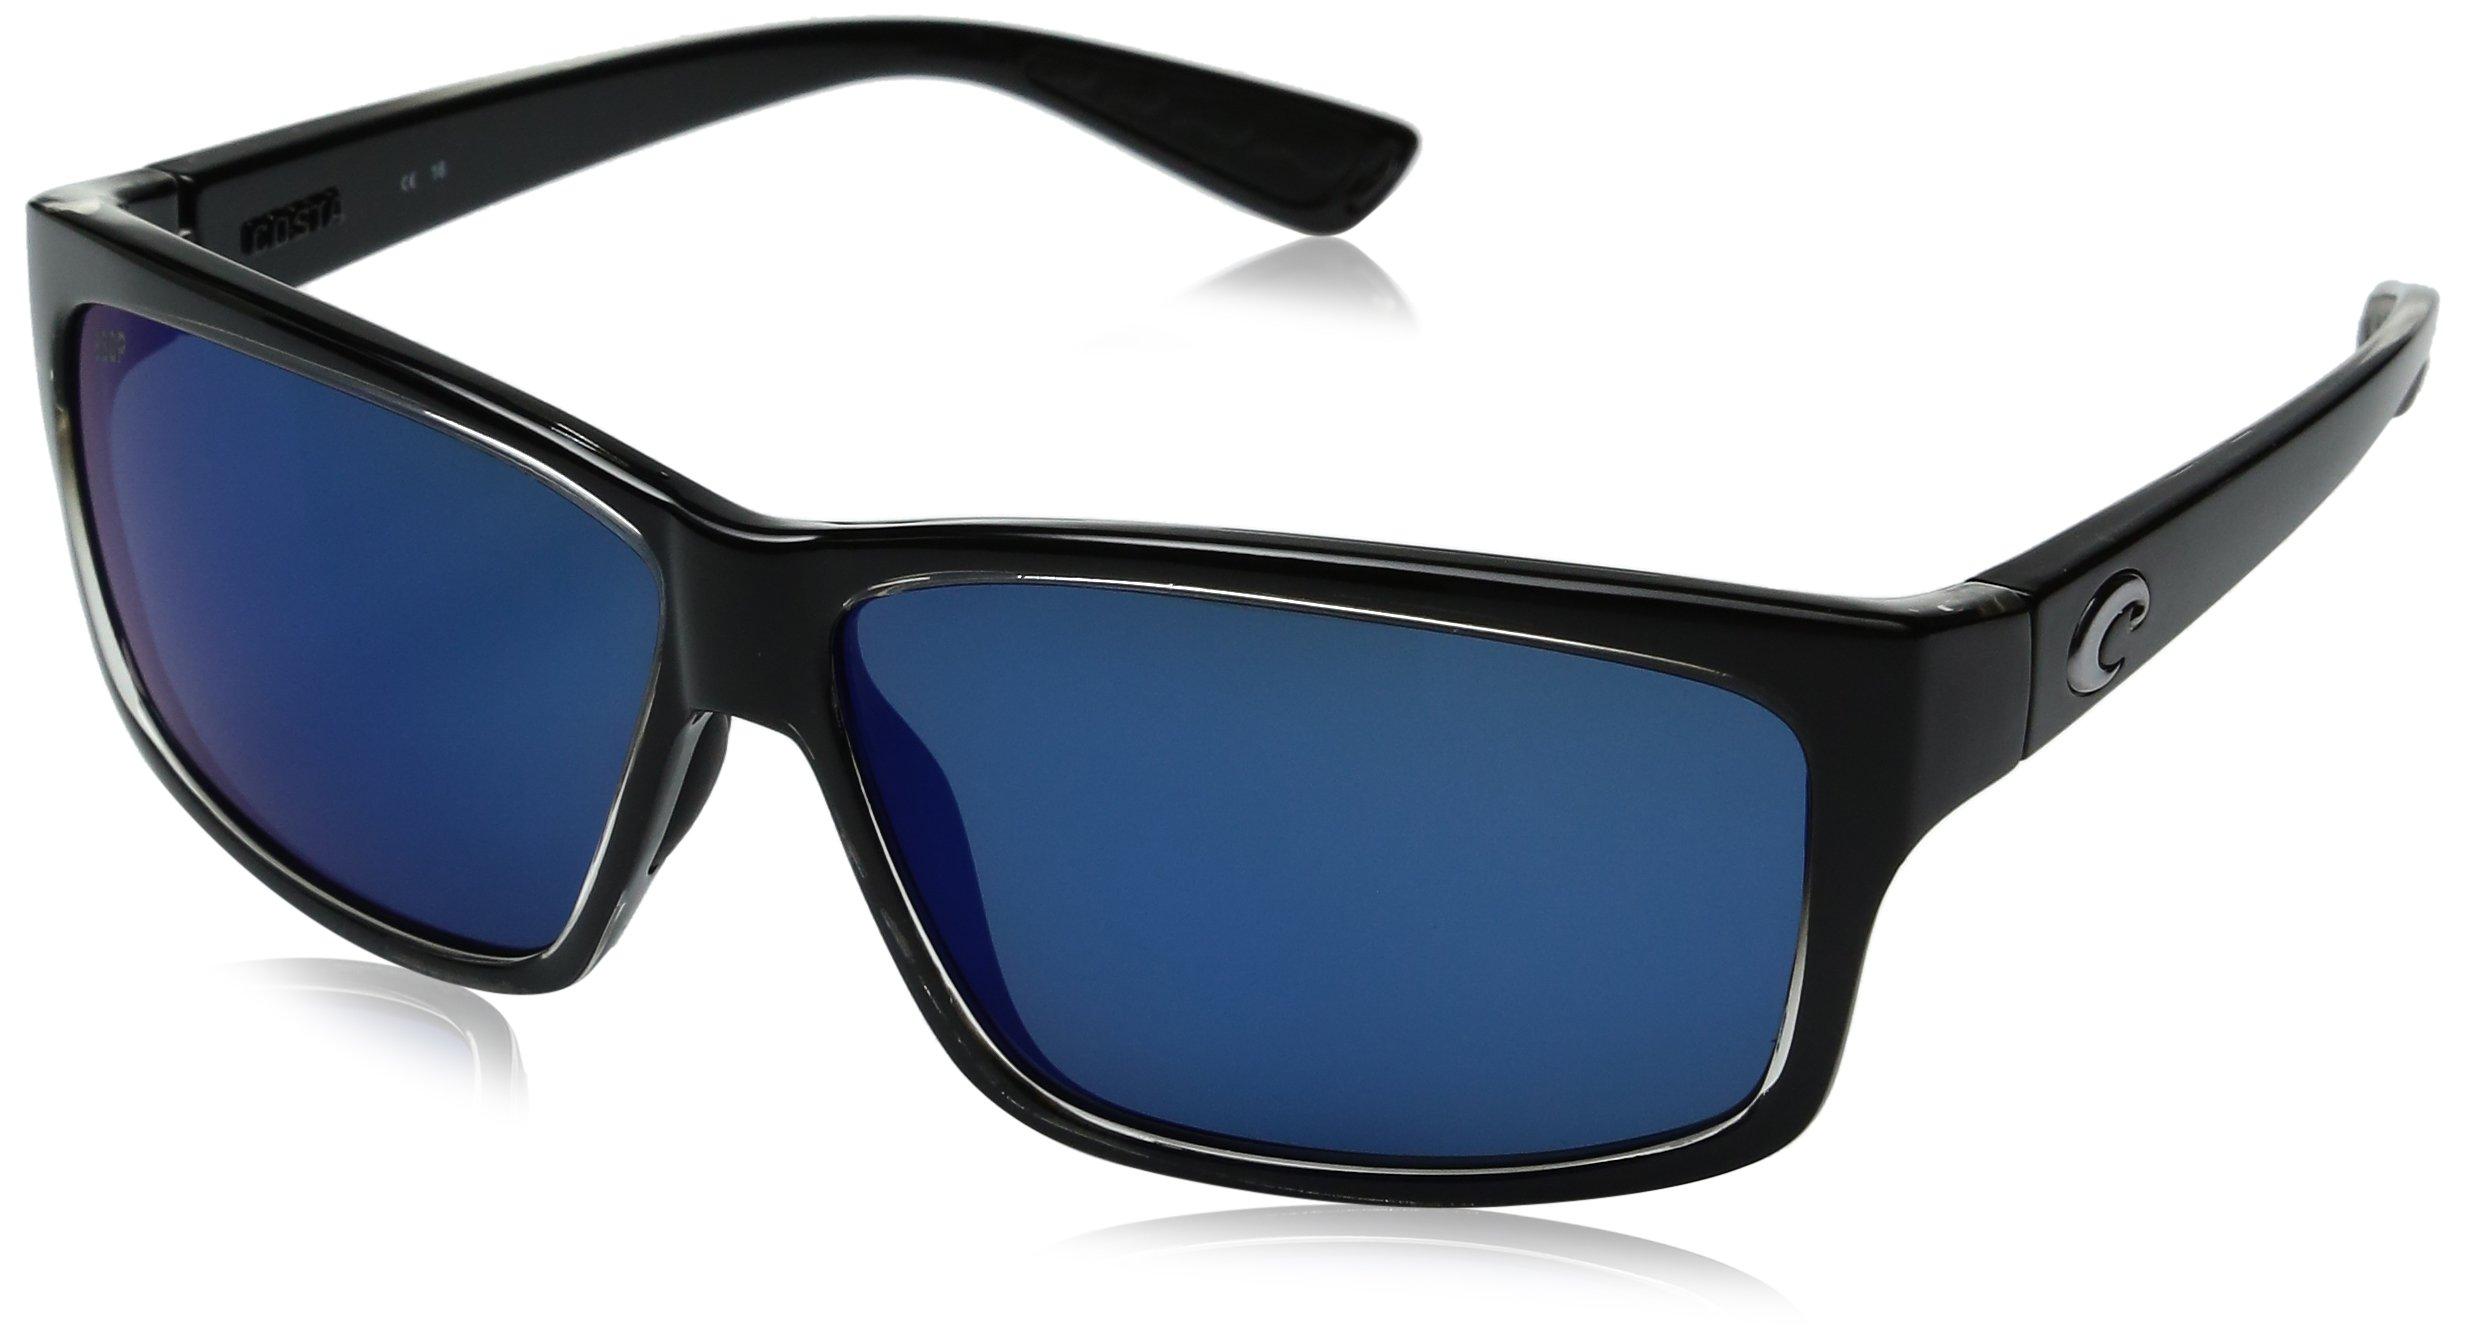 Costa del Mar Cut Polarized Rectangular Sunglasses, Squall/Blue Mirror 580 Plastic